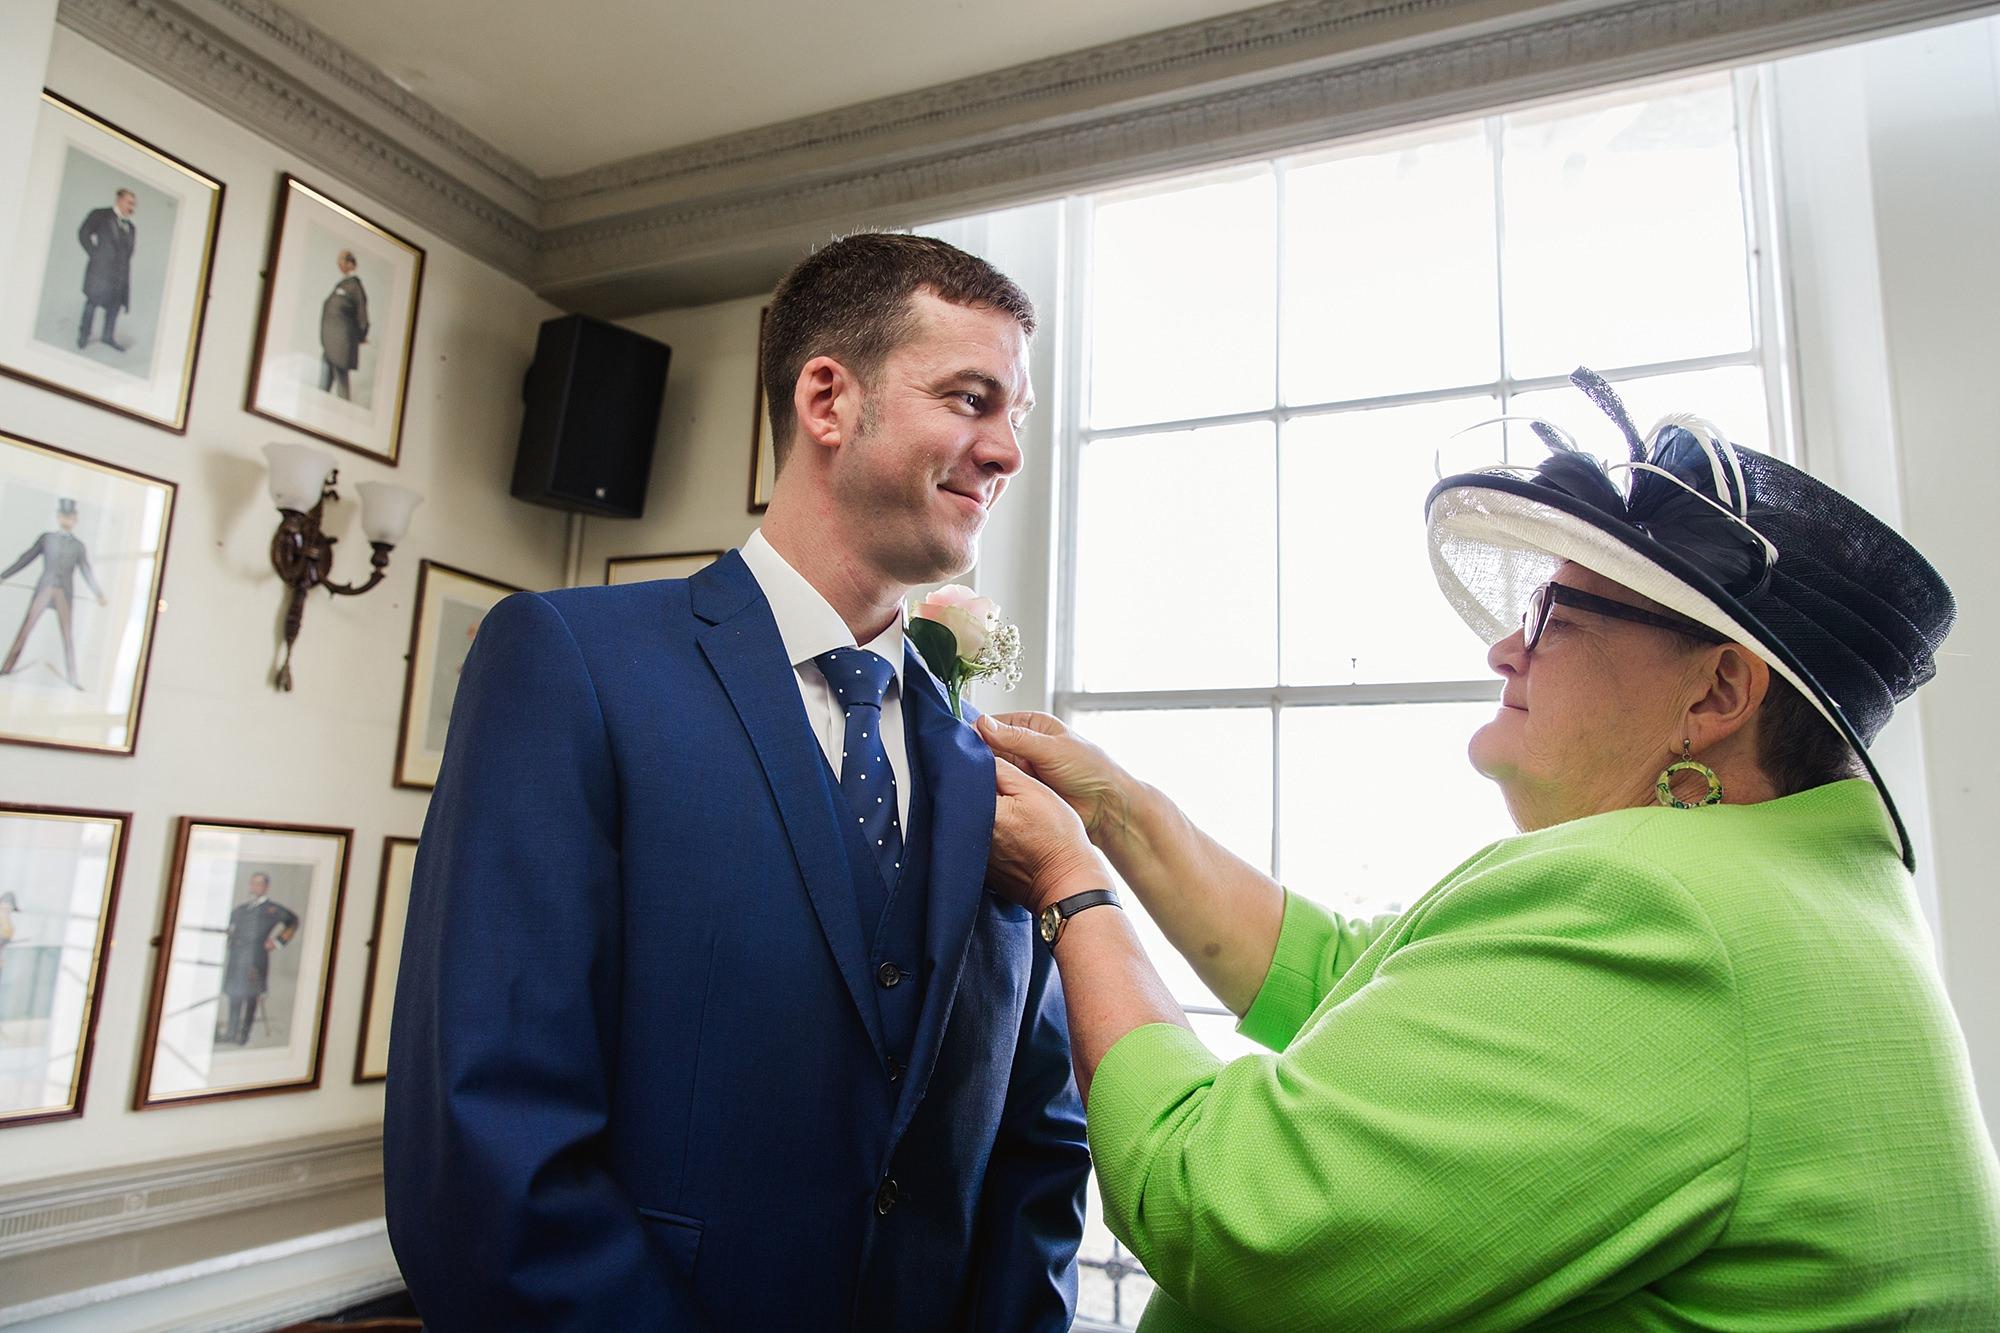 Trafalgar Tavern wedding groom's mum adjusts his buttonhole